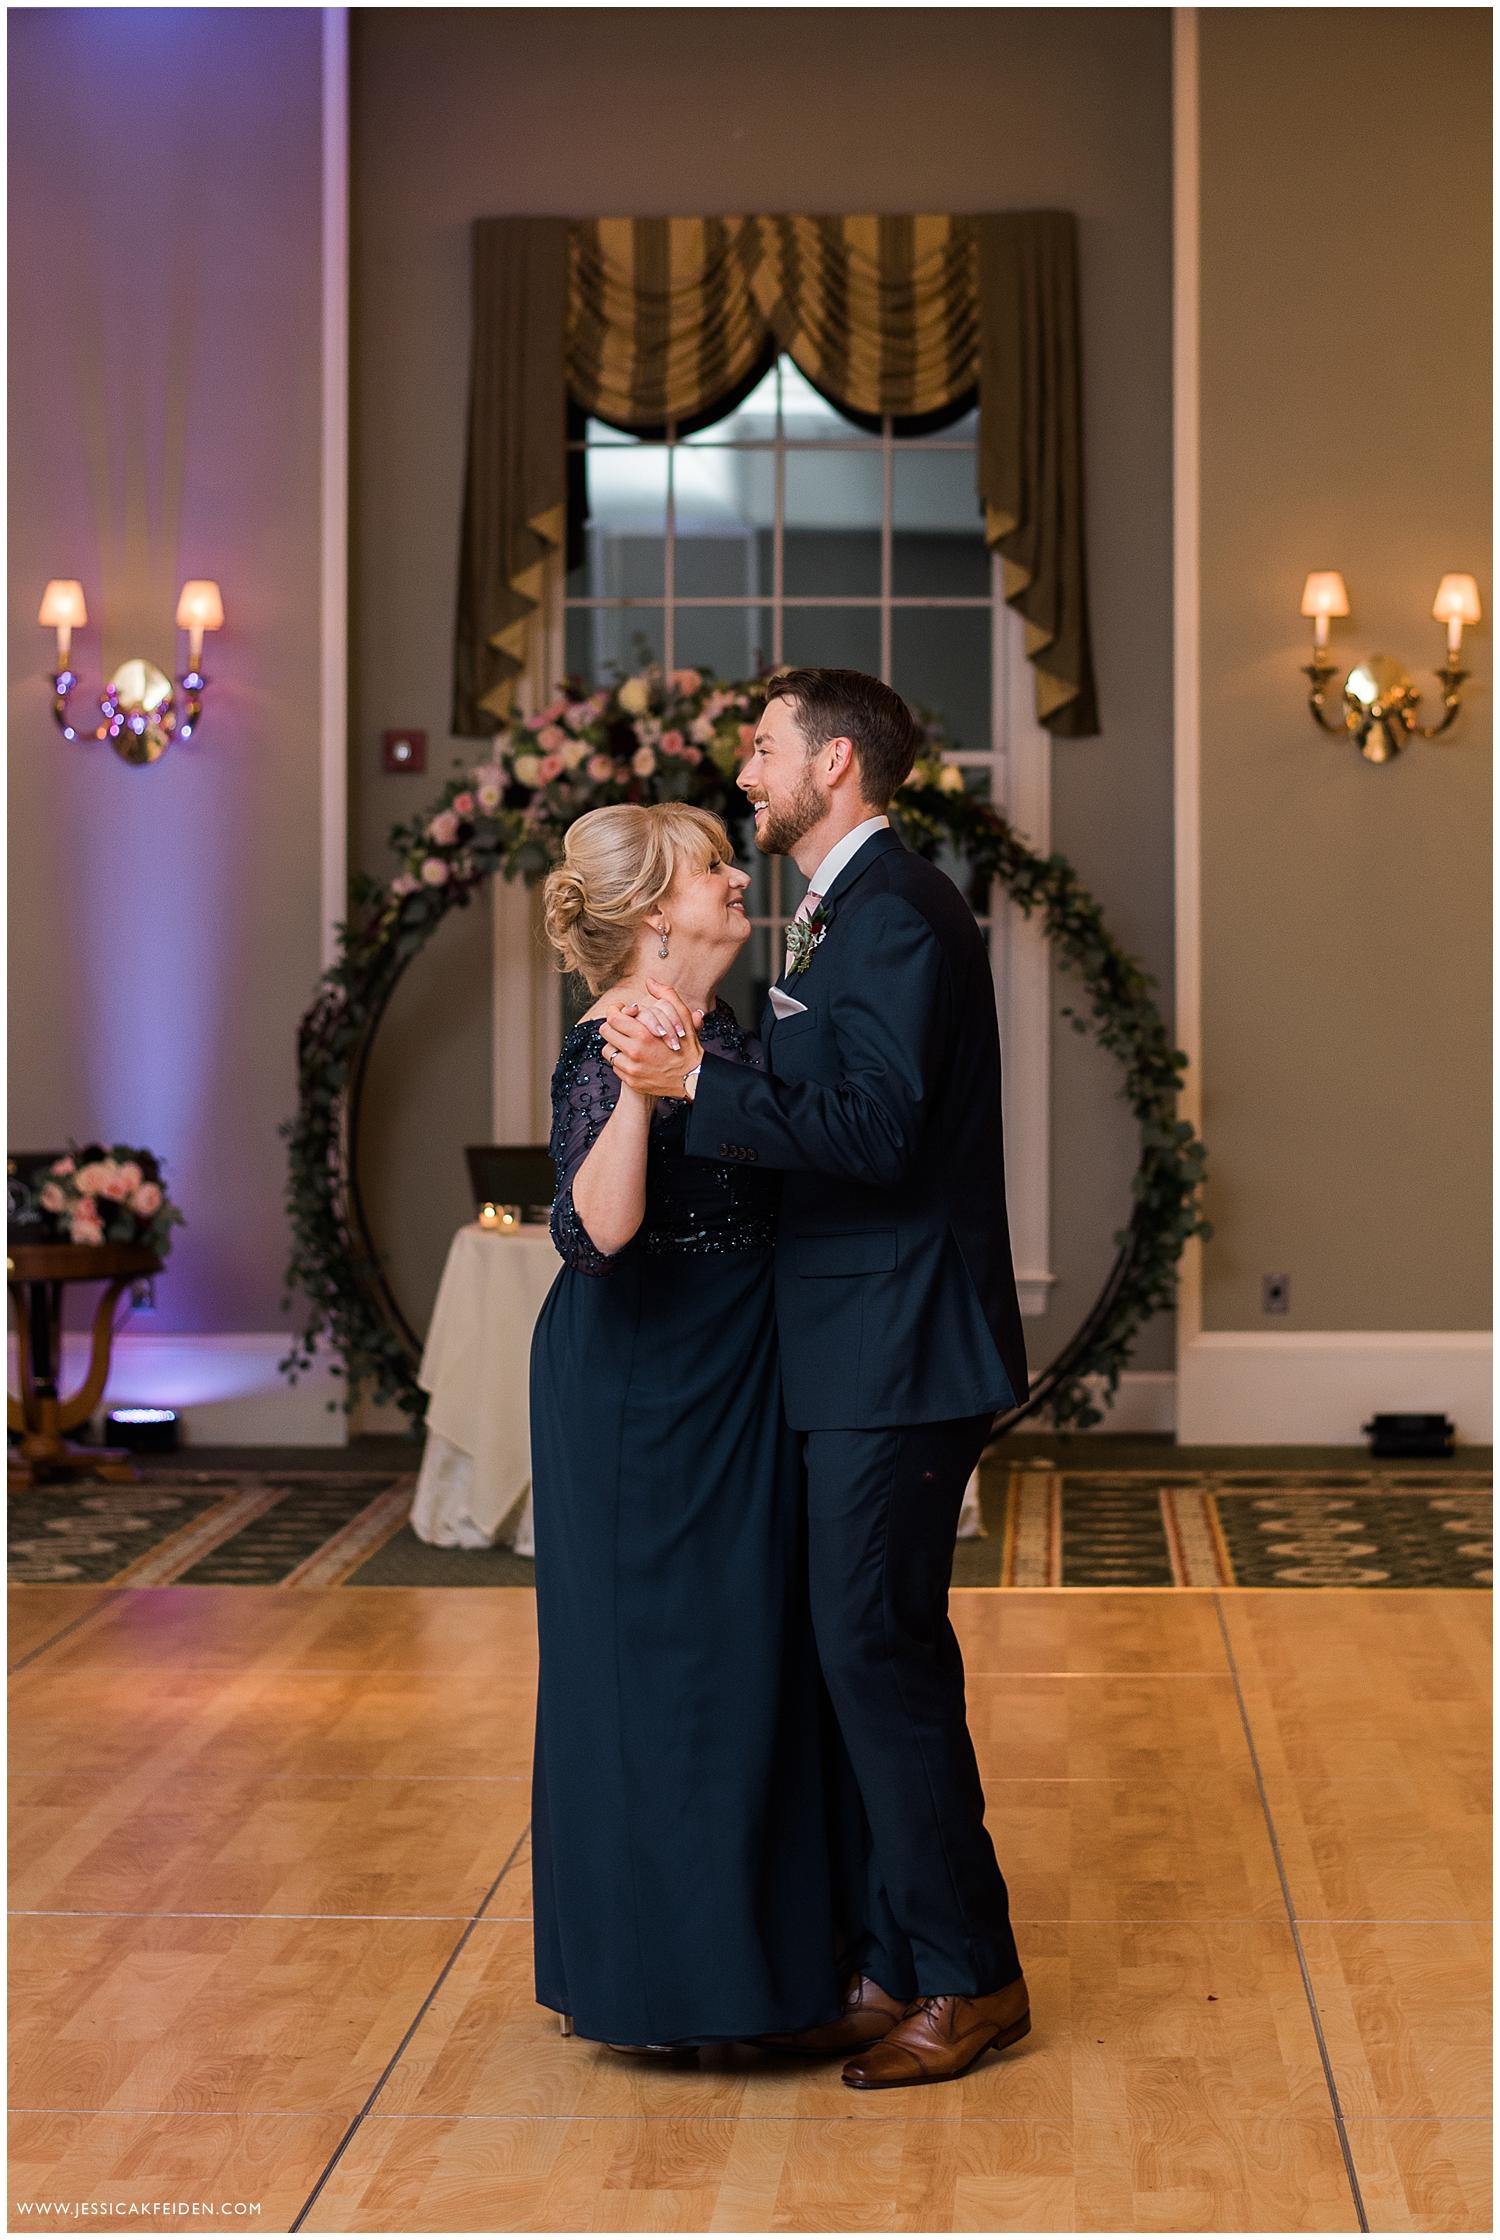 Jessica K Feiden Photography_Charter Oak Country Club Wedding_0055.jpg